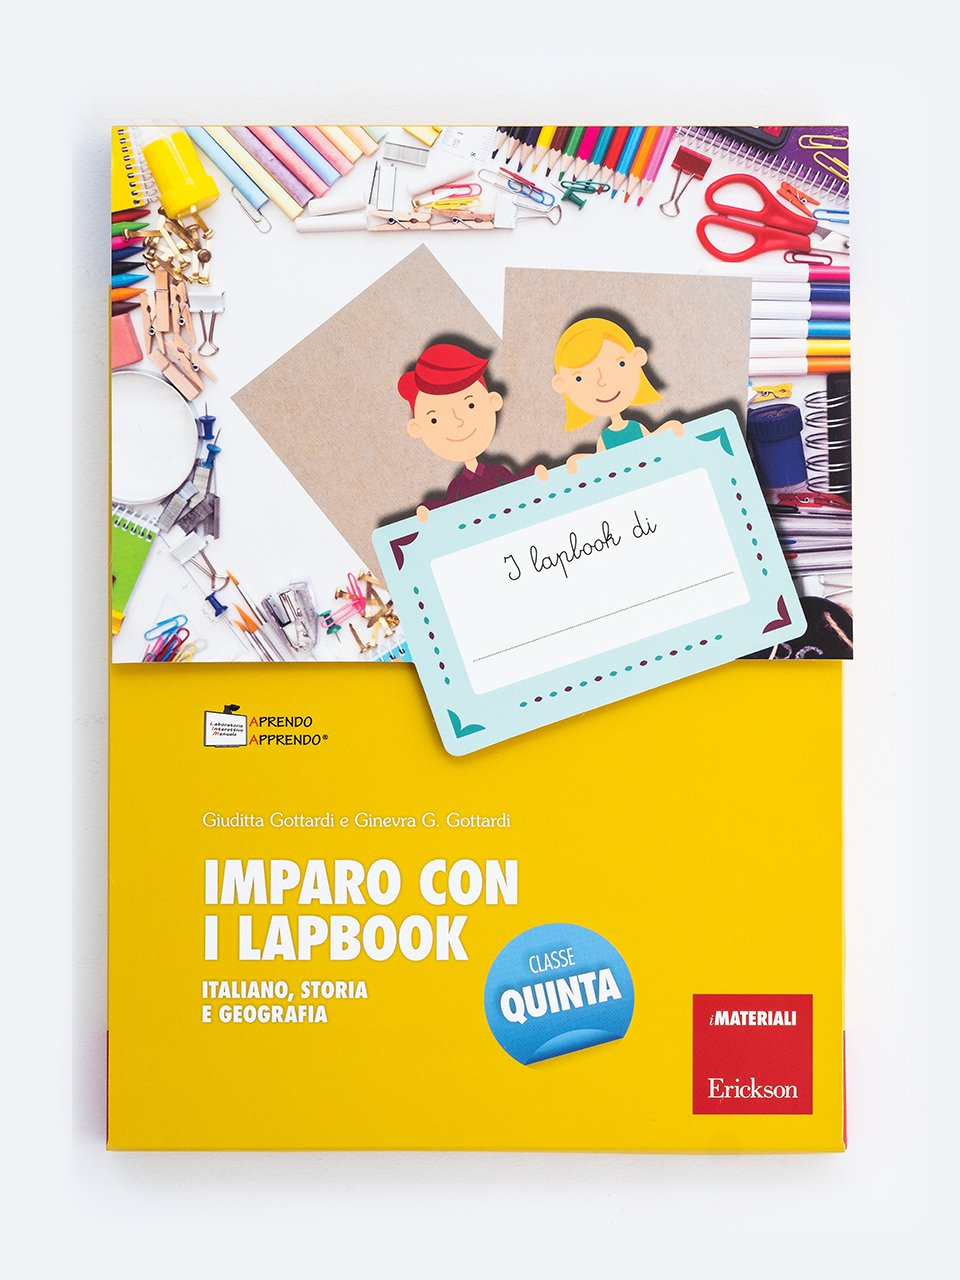 Imparo con i lapbook - Italiano, storia e geografia - Classe quinta - Ginevra G. Gottardi - Erickson